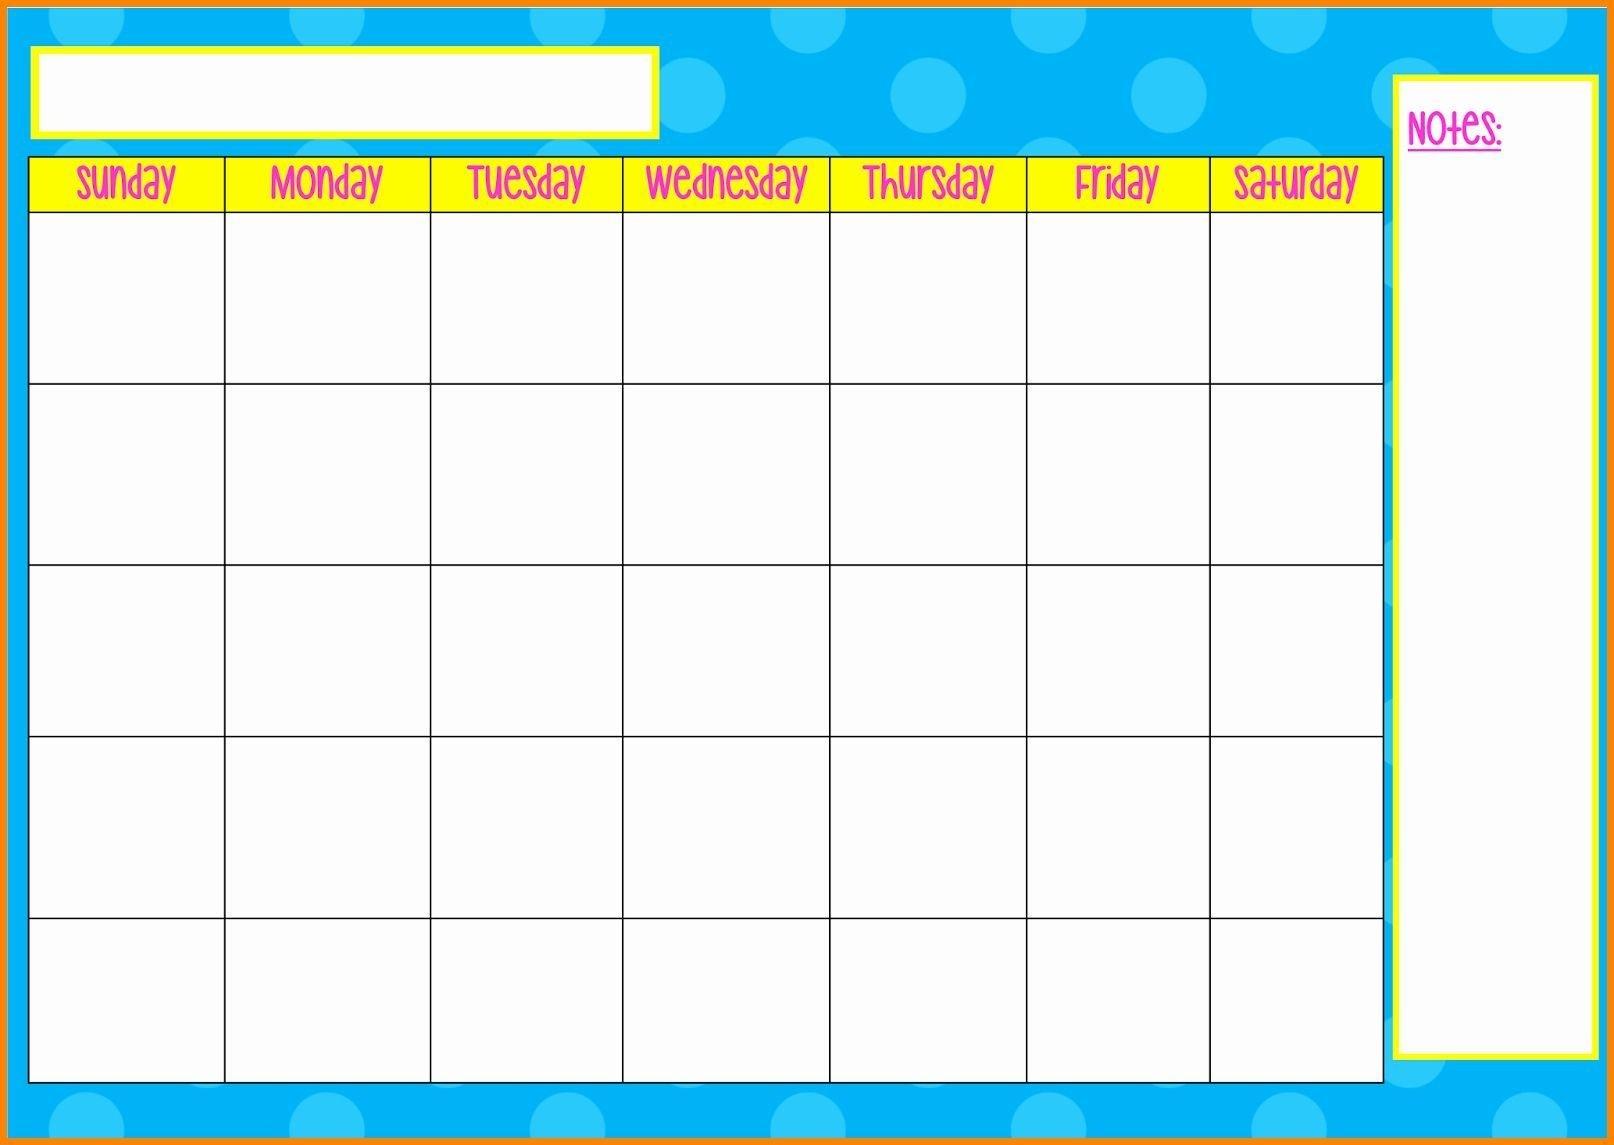 How To Monday Through Friday Calendar Word   Get Your Sample Calendar Monday To Friday